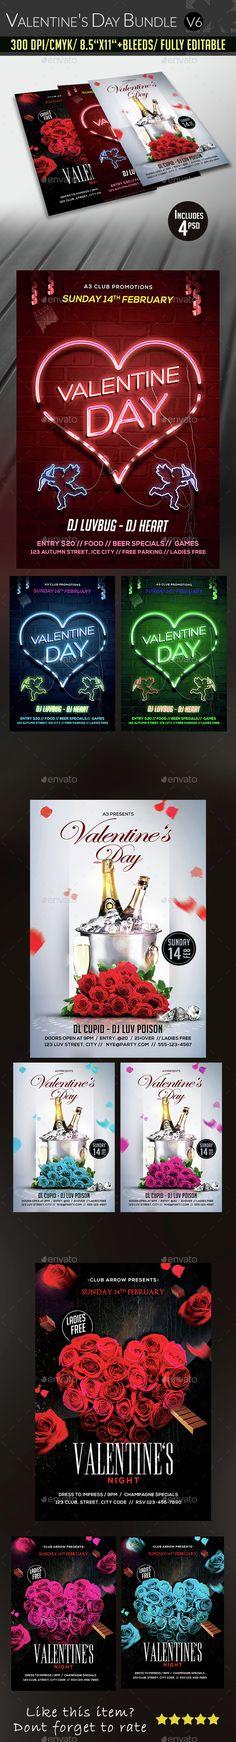 Valentine's Day Flyer Bundle Template PSD. Download here: http://graphicriver.net/item/valentines-day-flyer-bundle-v6/14648991?ref=ksioks